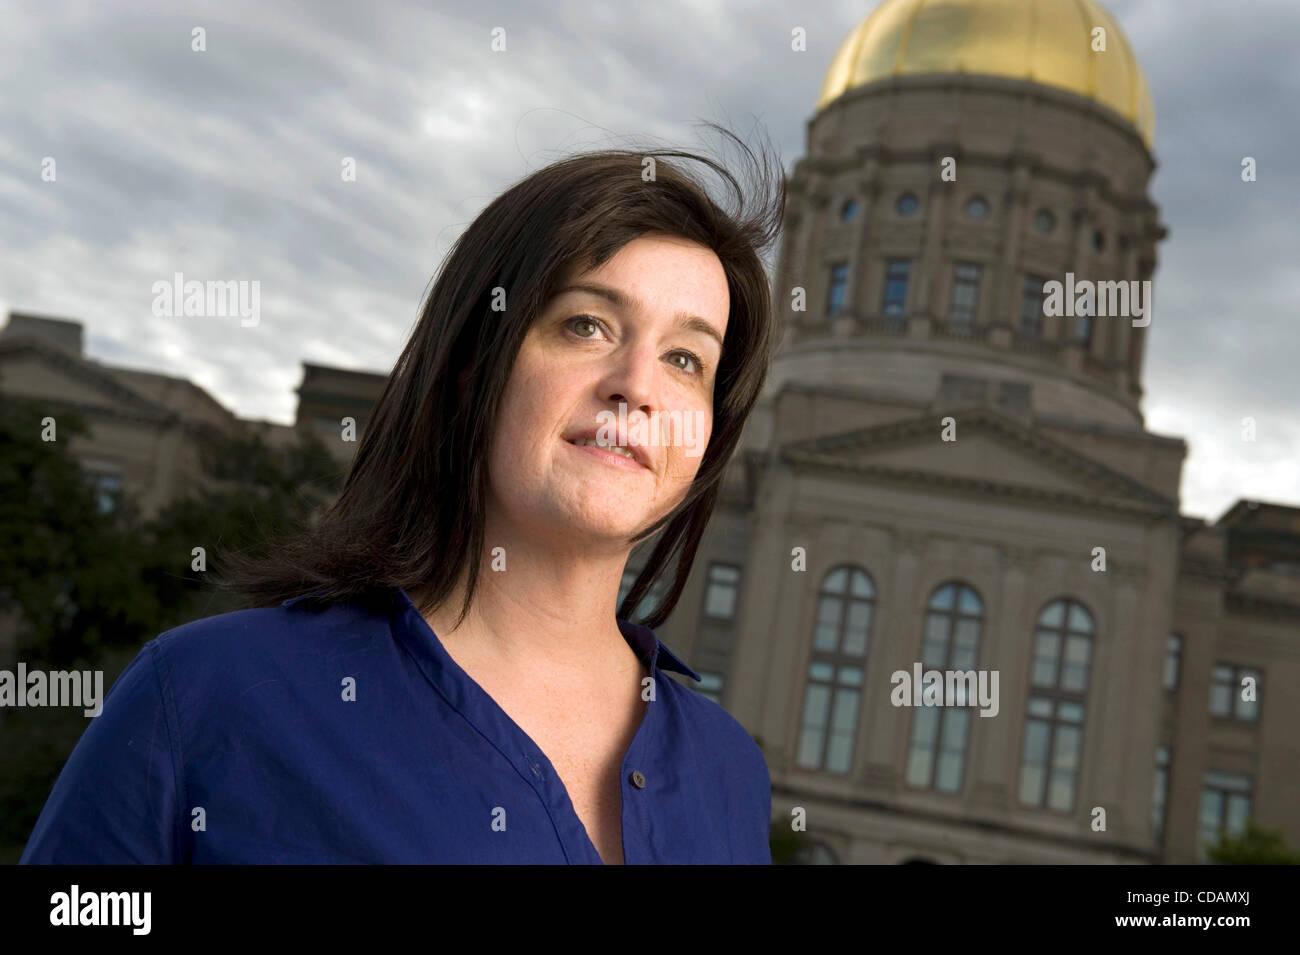 Sept 9, 2010 - Atlanta, Georgia, U.S. - VANDY BETH GLENN, a former Georgia state legislative editor who was fired - Stock Image